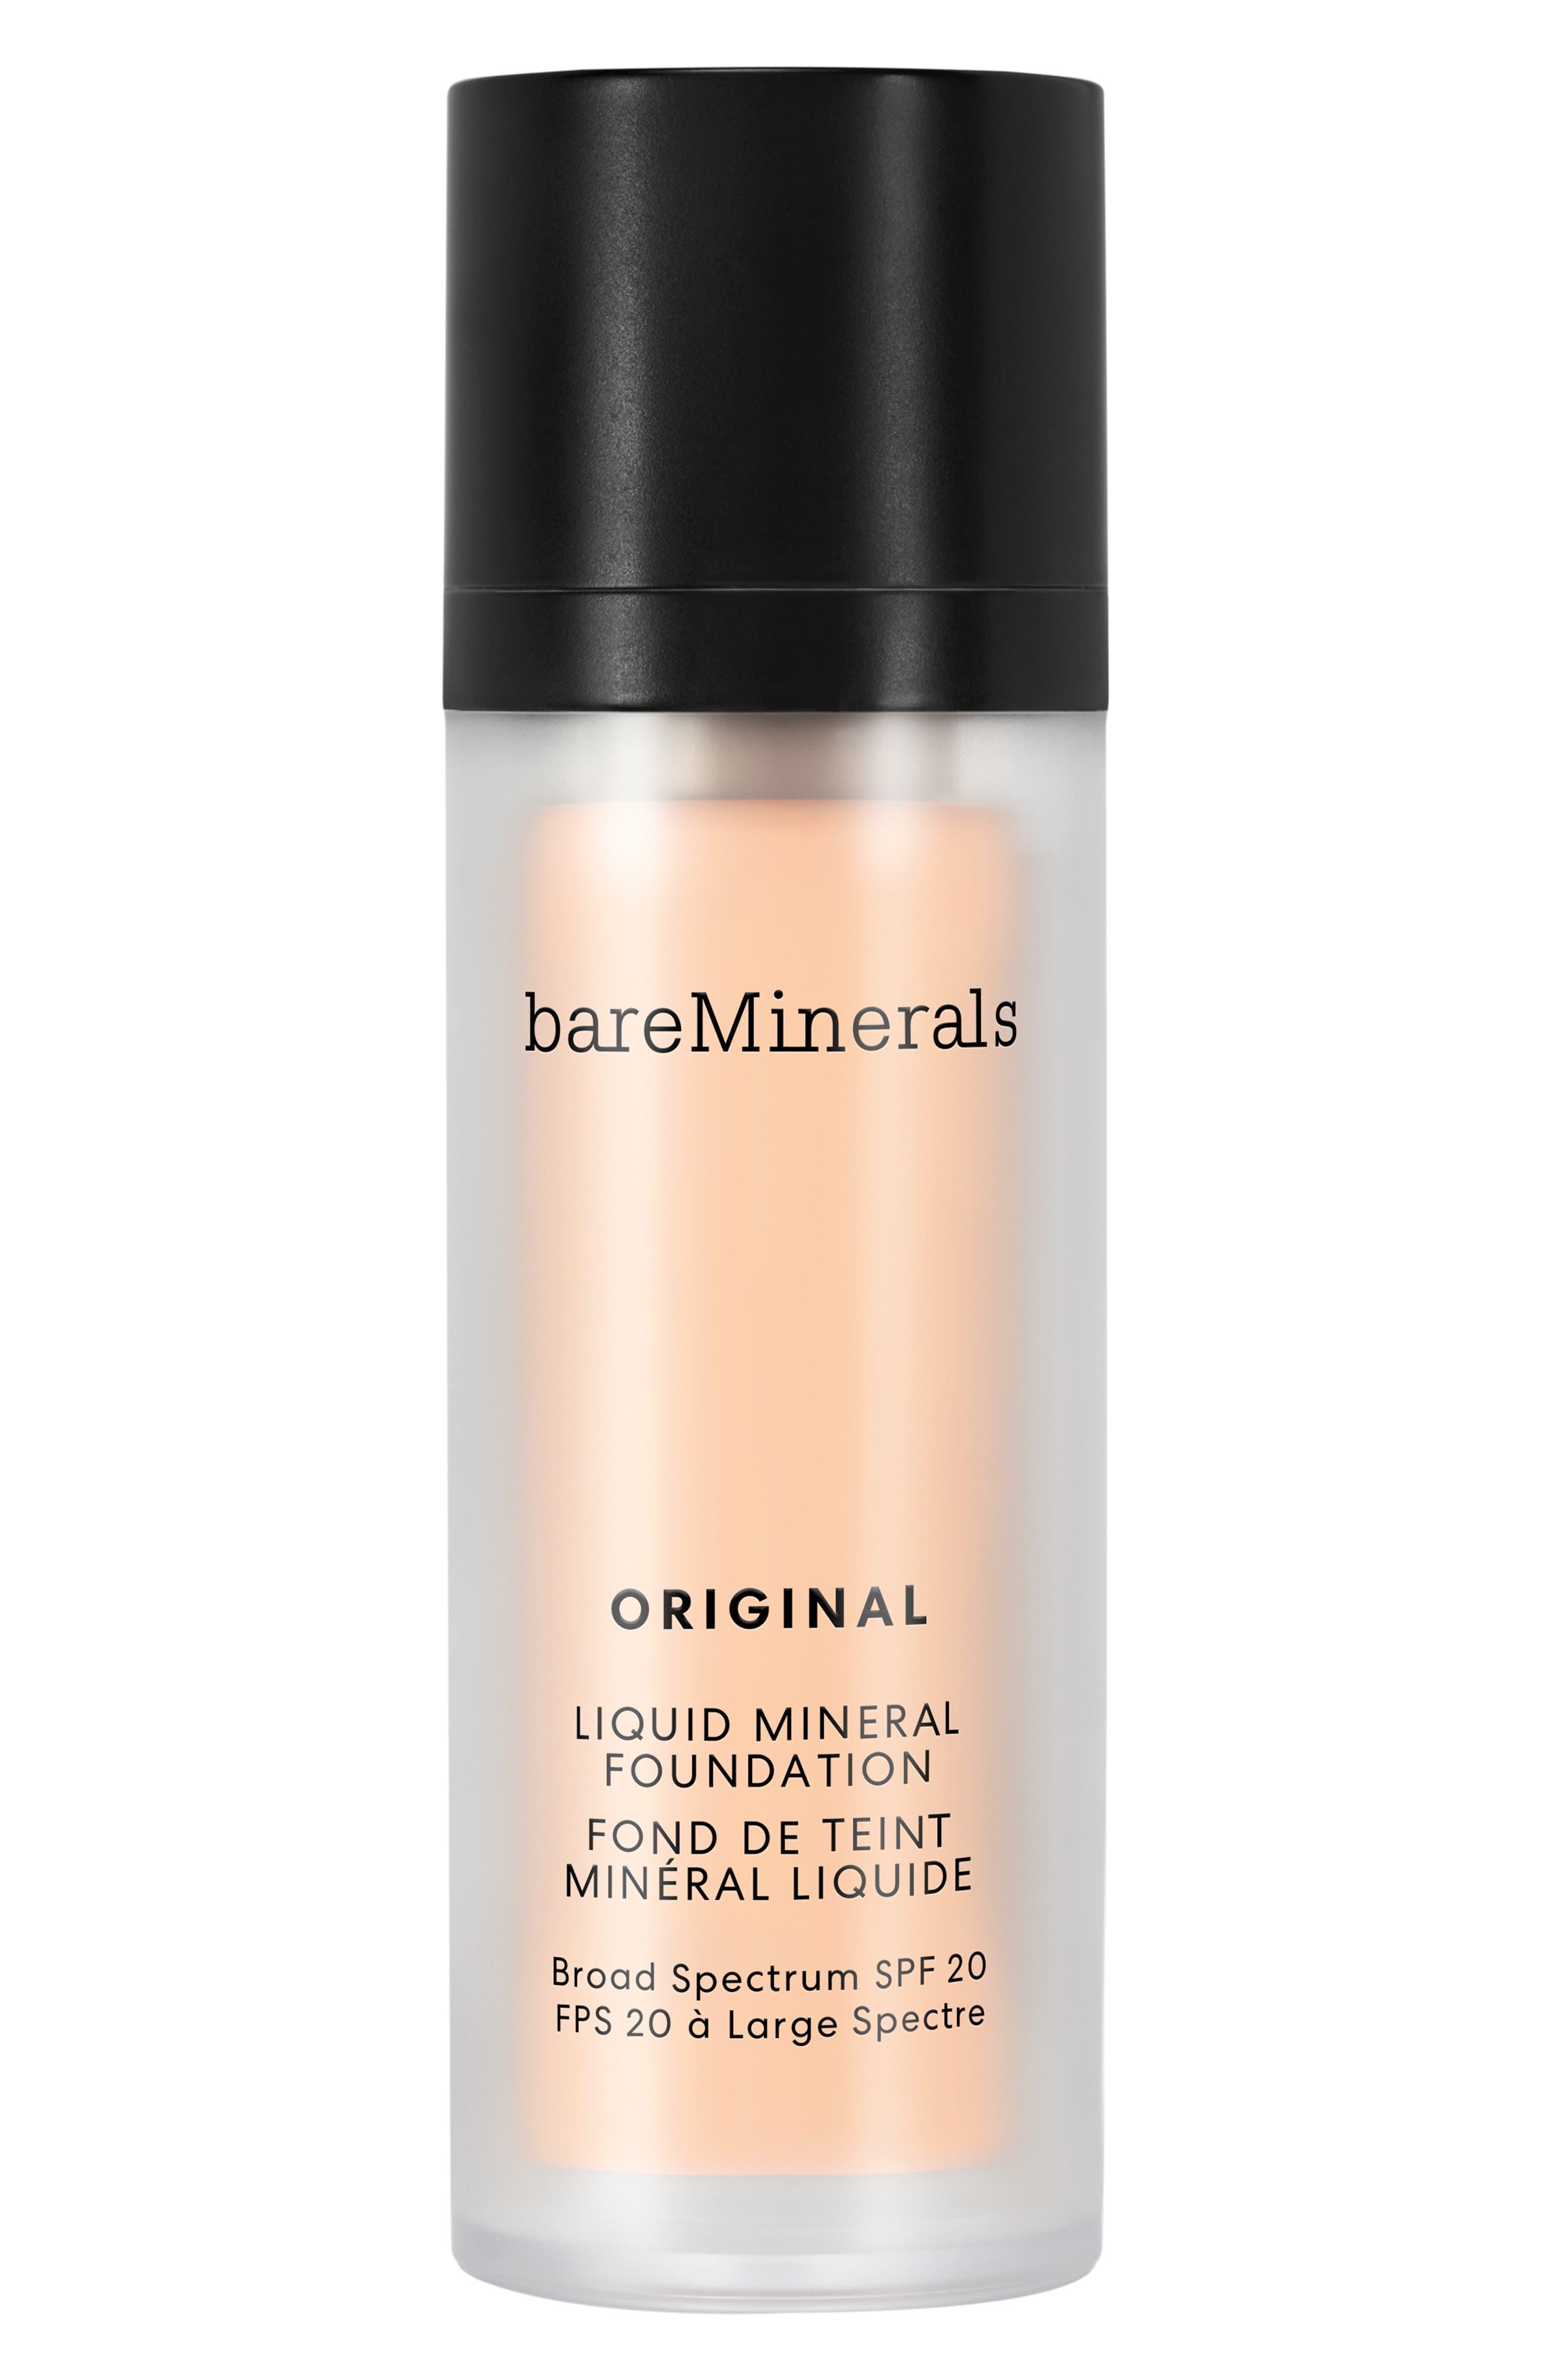 Bareminerals Original Mineral Liquid Foundation